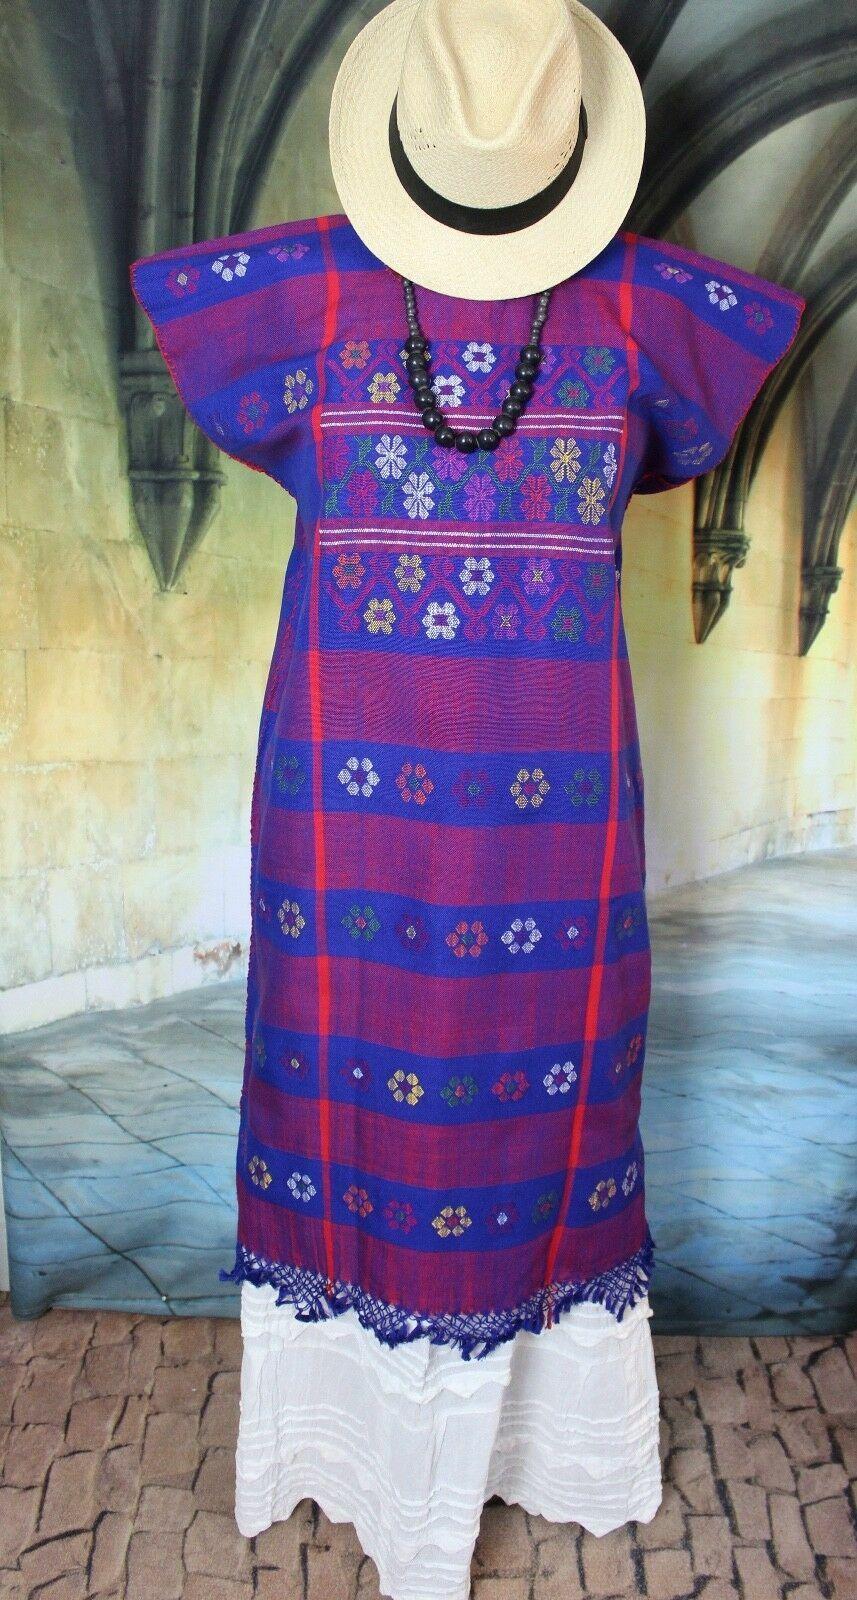 M L Mexican Huipil Dress Kaftan Hand Woven Blau & rot Amuzgo Vintage Style Boho